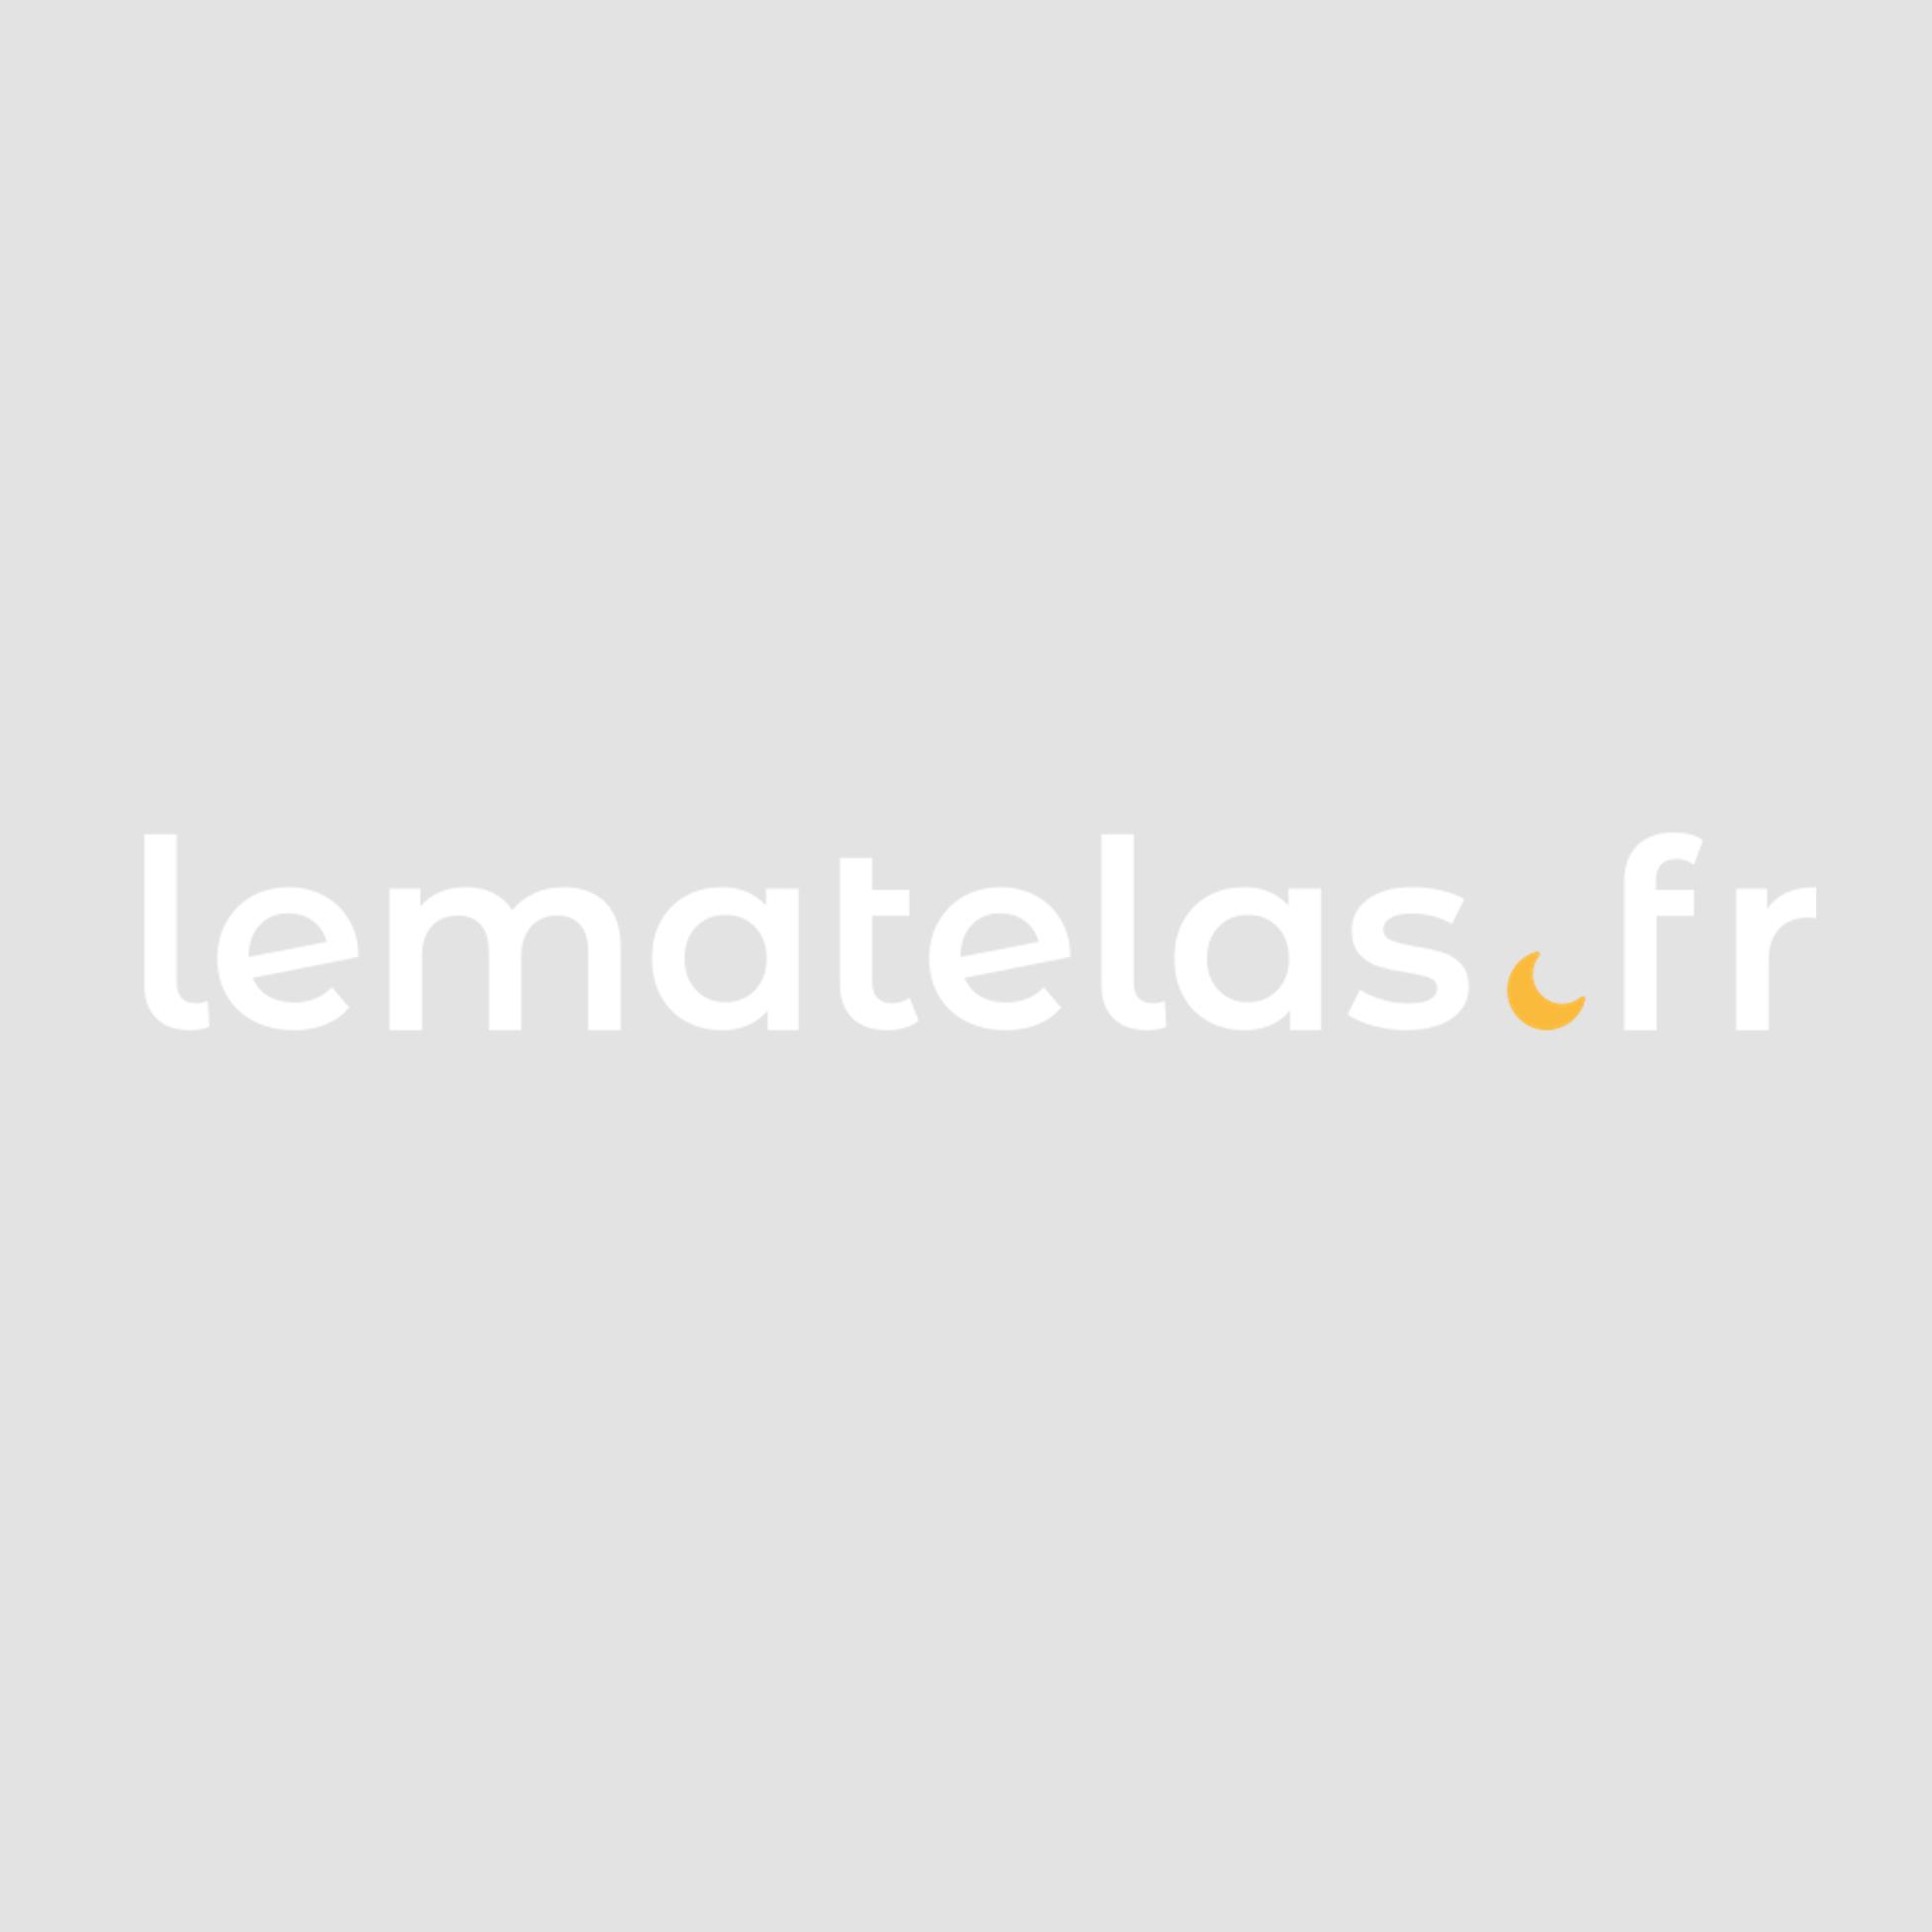 Ensemble Lit futon style japonais + matelas futon écru